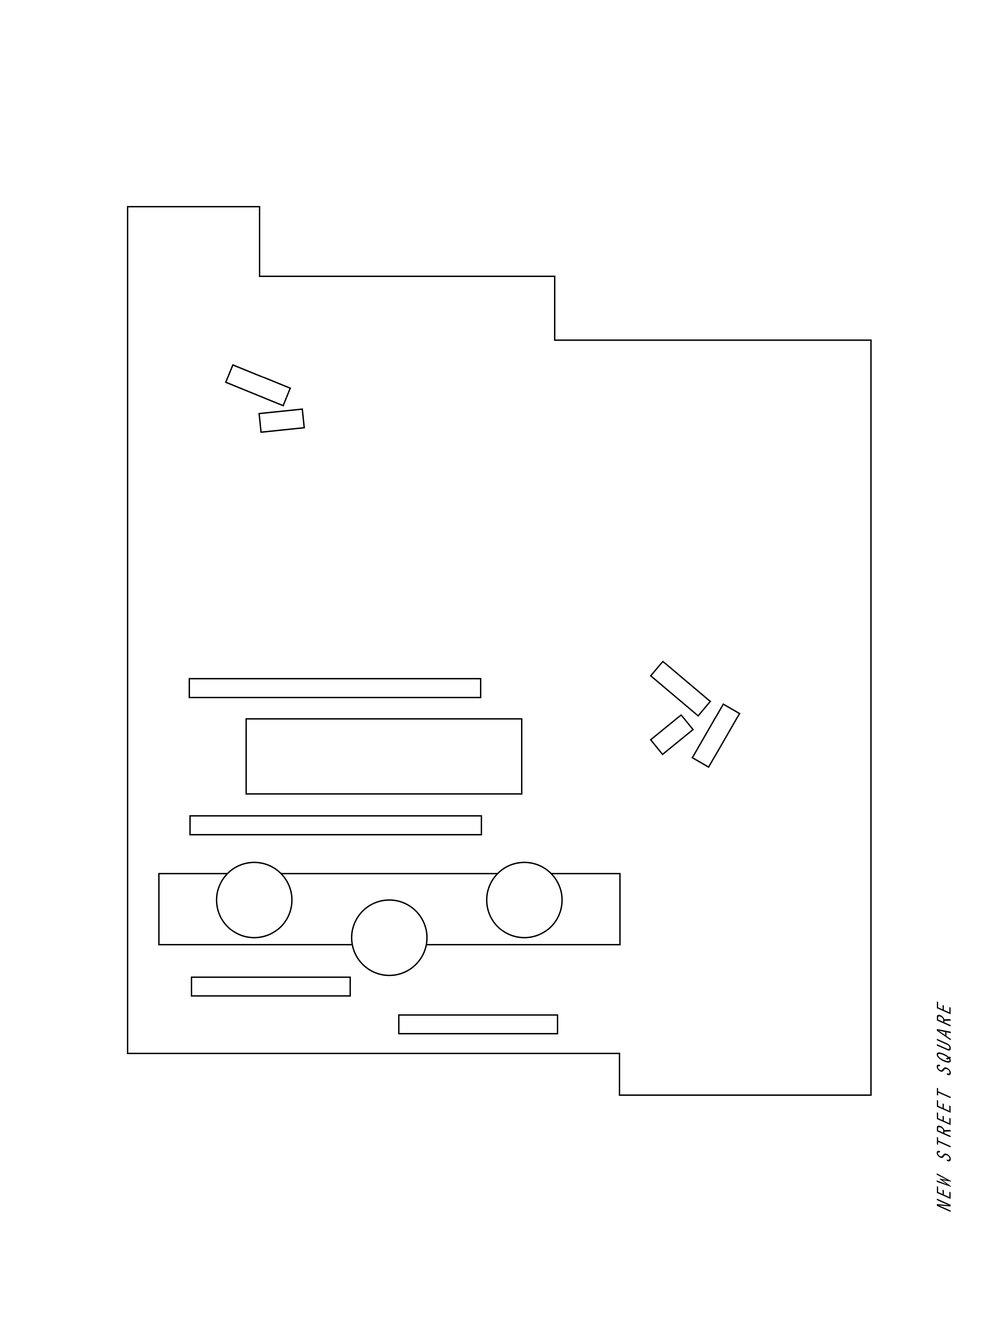 second book8.jpg